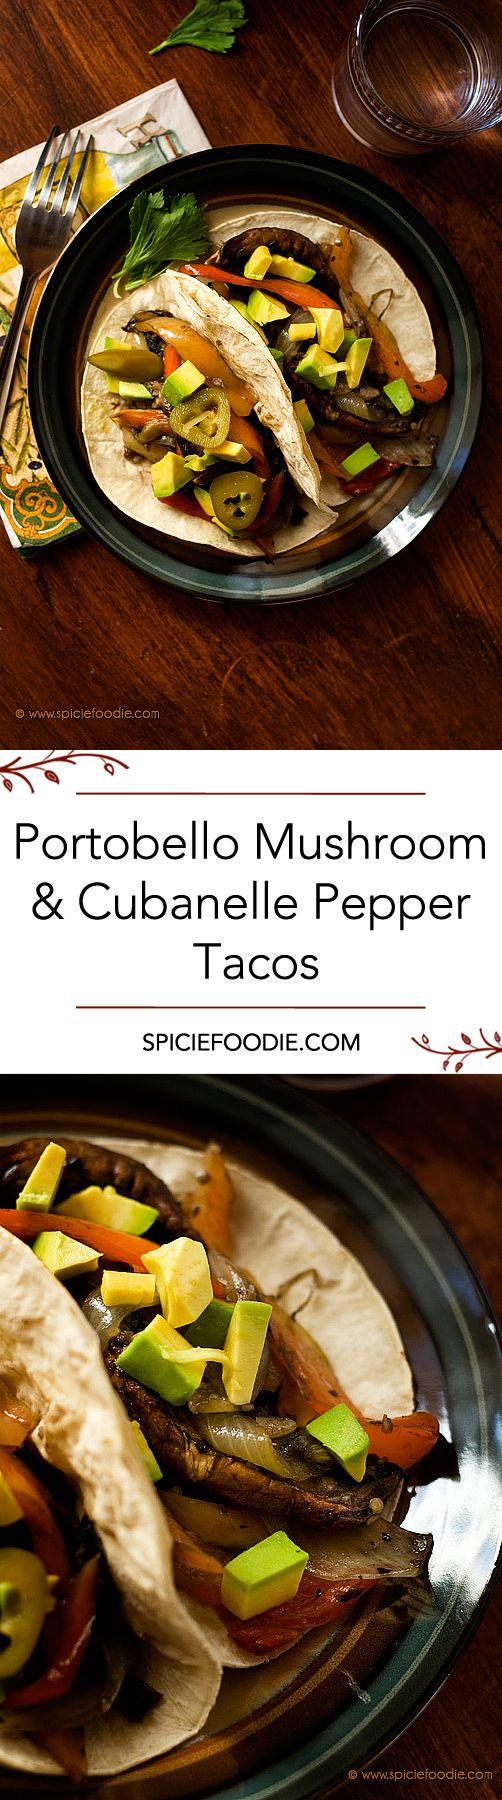 Portobello Mushroom and Cubanelle Pepper Tacos Recipe | #tacos #vegan |#meatlessmonday Sounds interesting!!!!